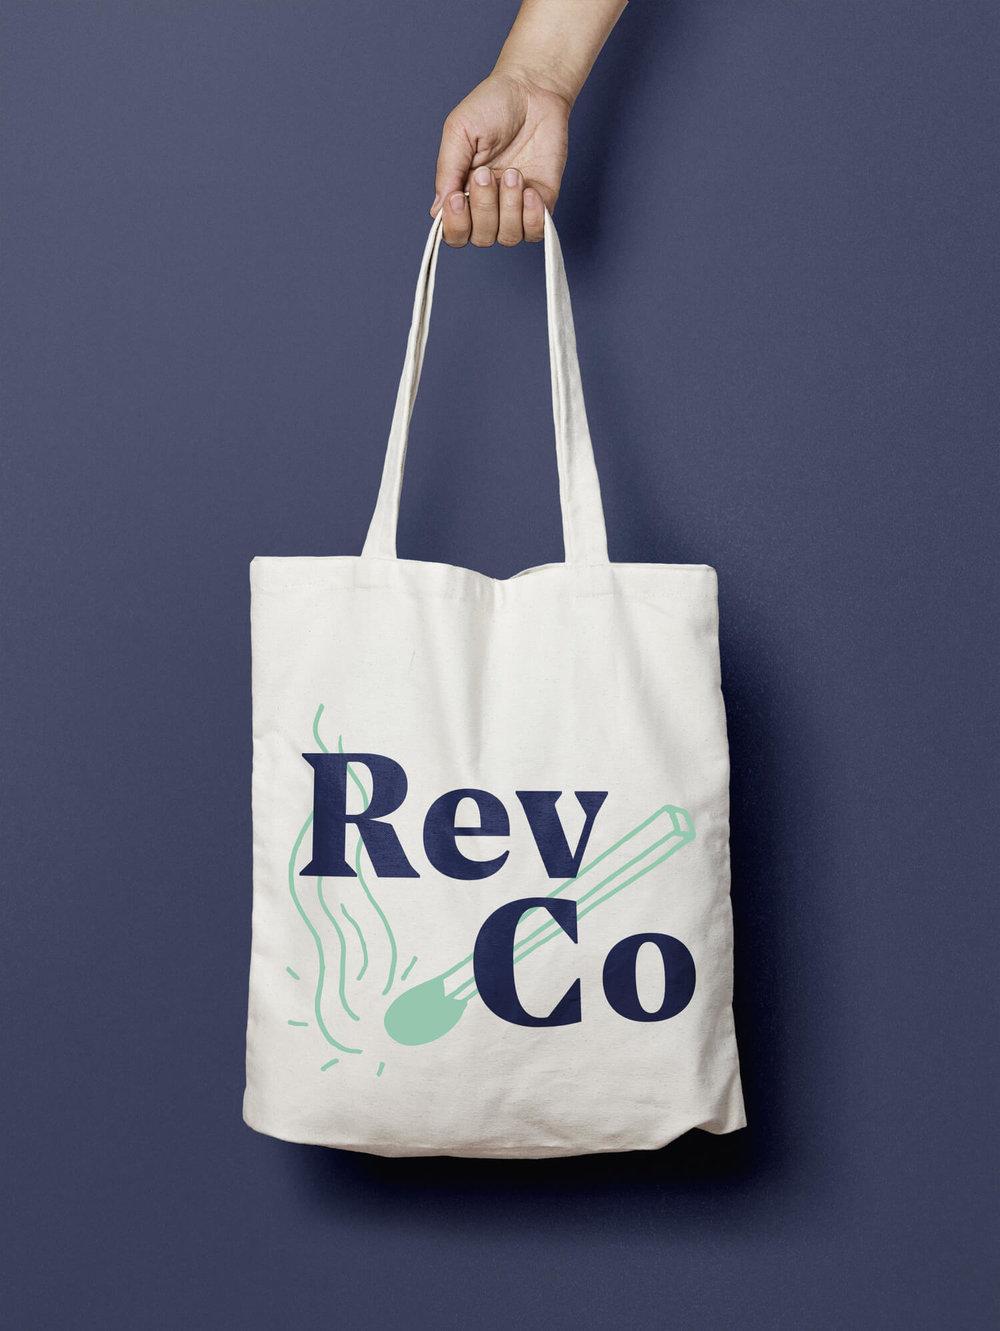 Revelry Collective